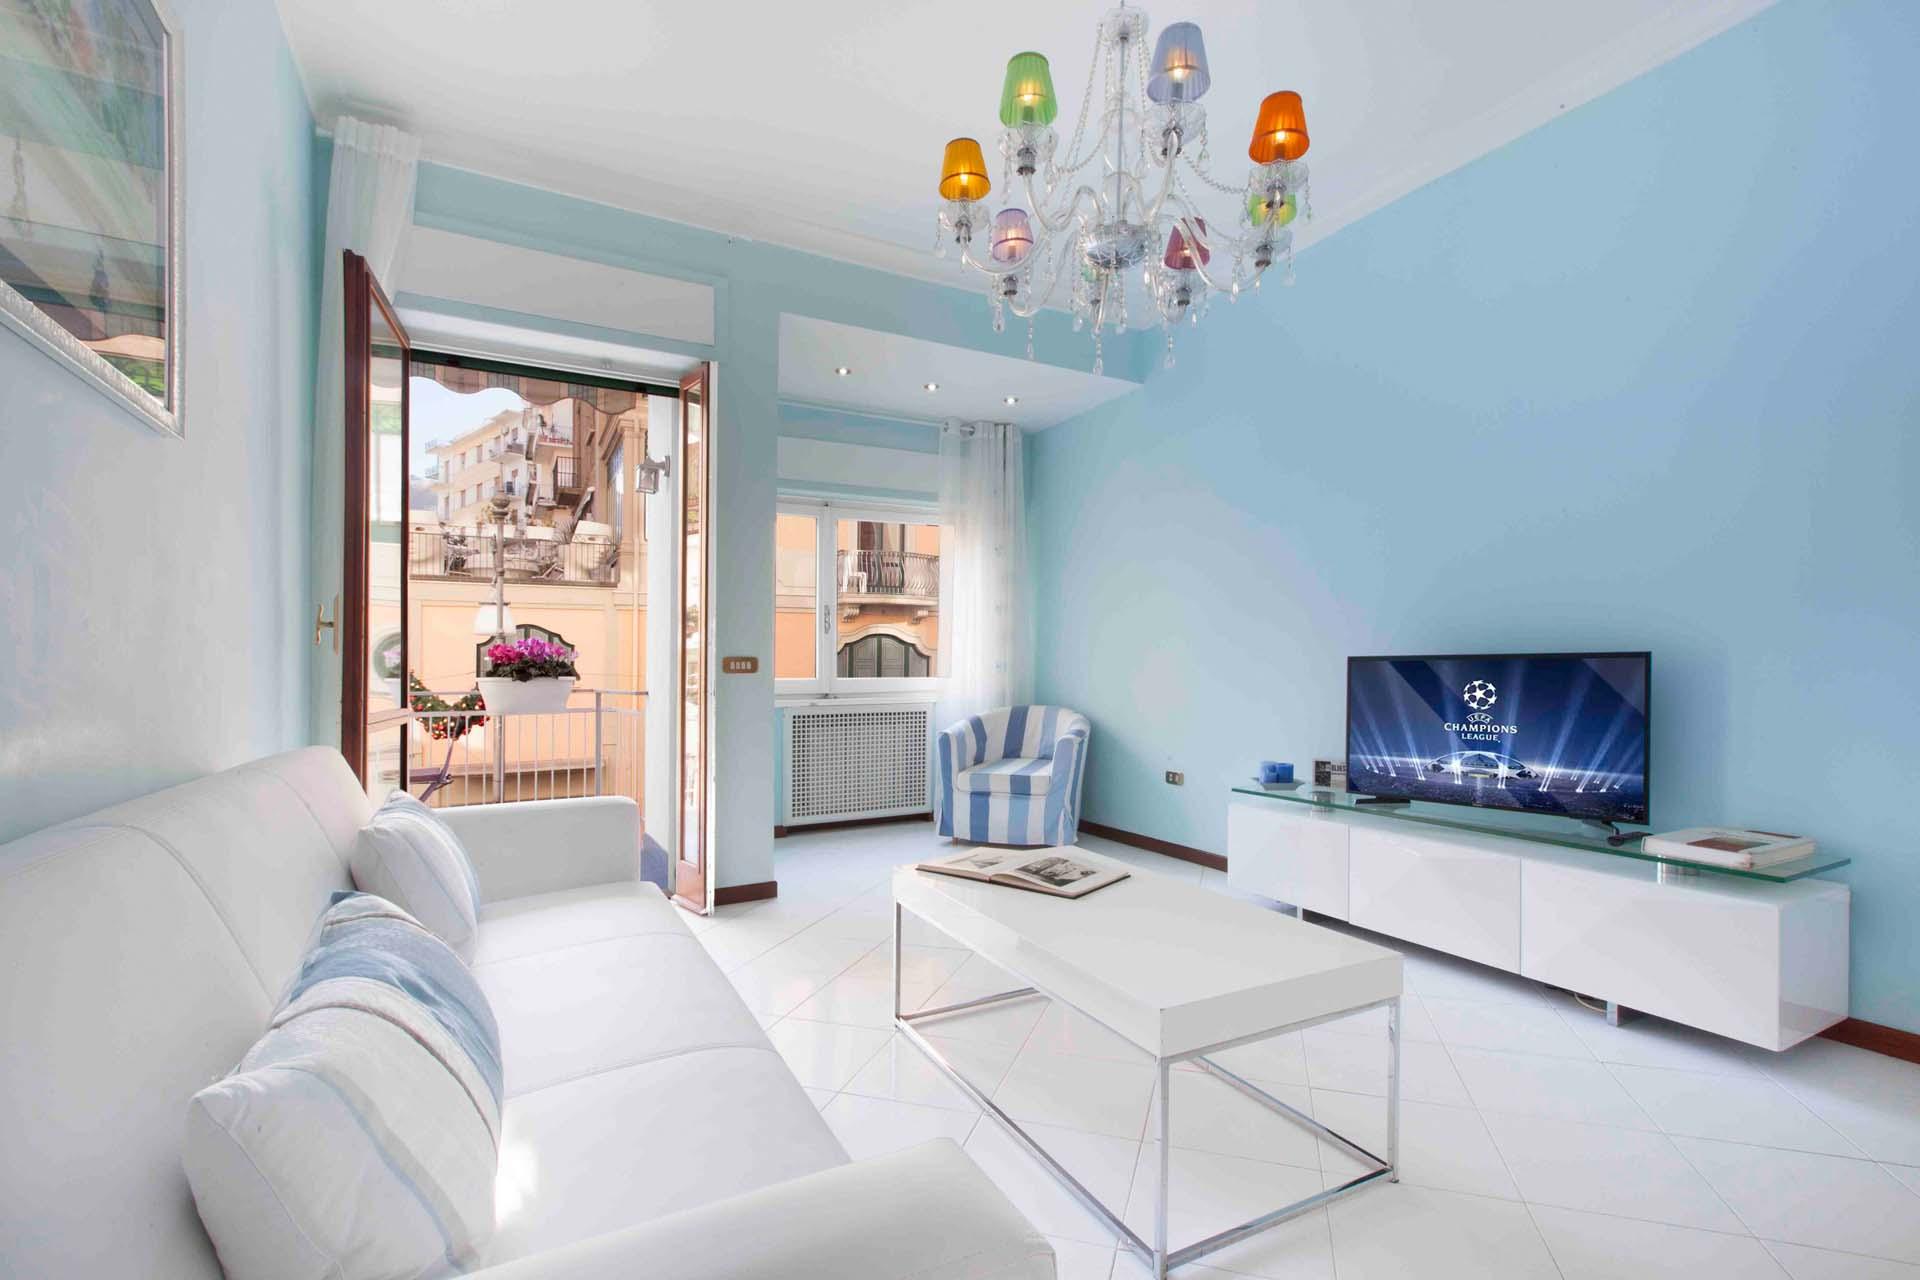 Vanna Home Apartment in Sorrento